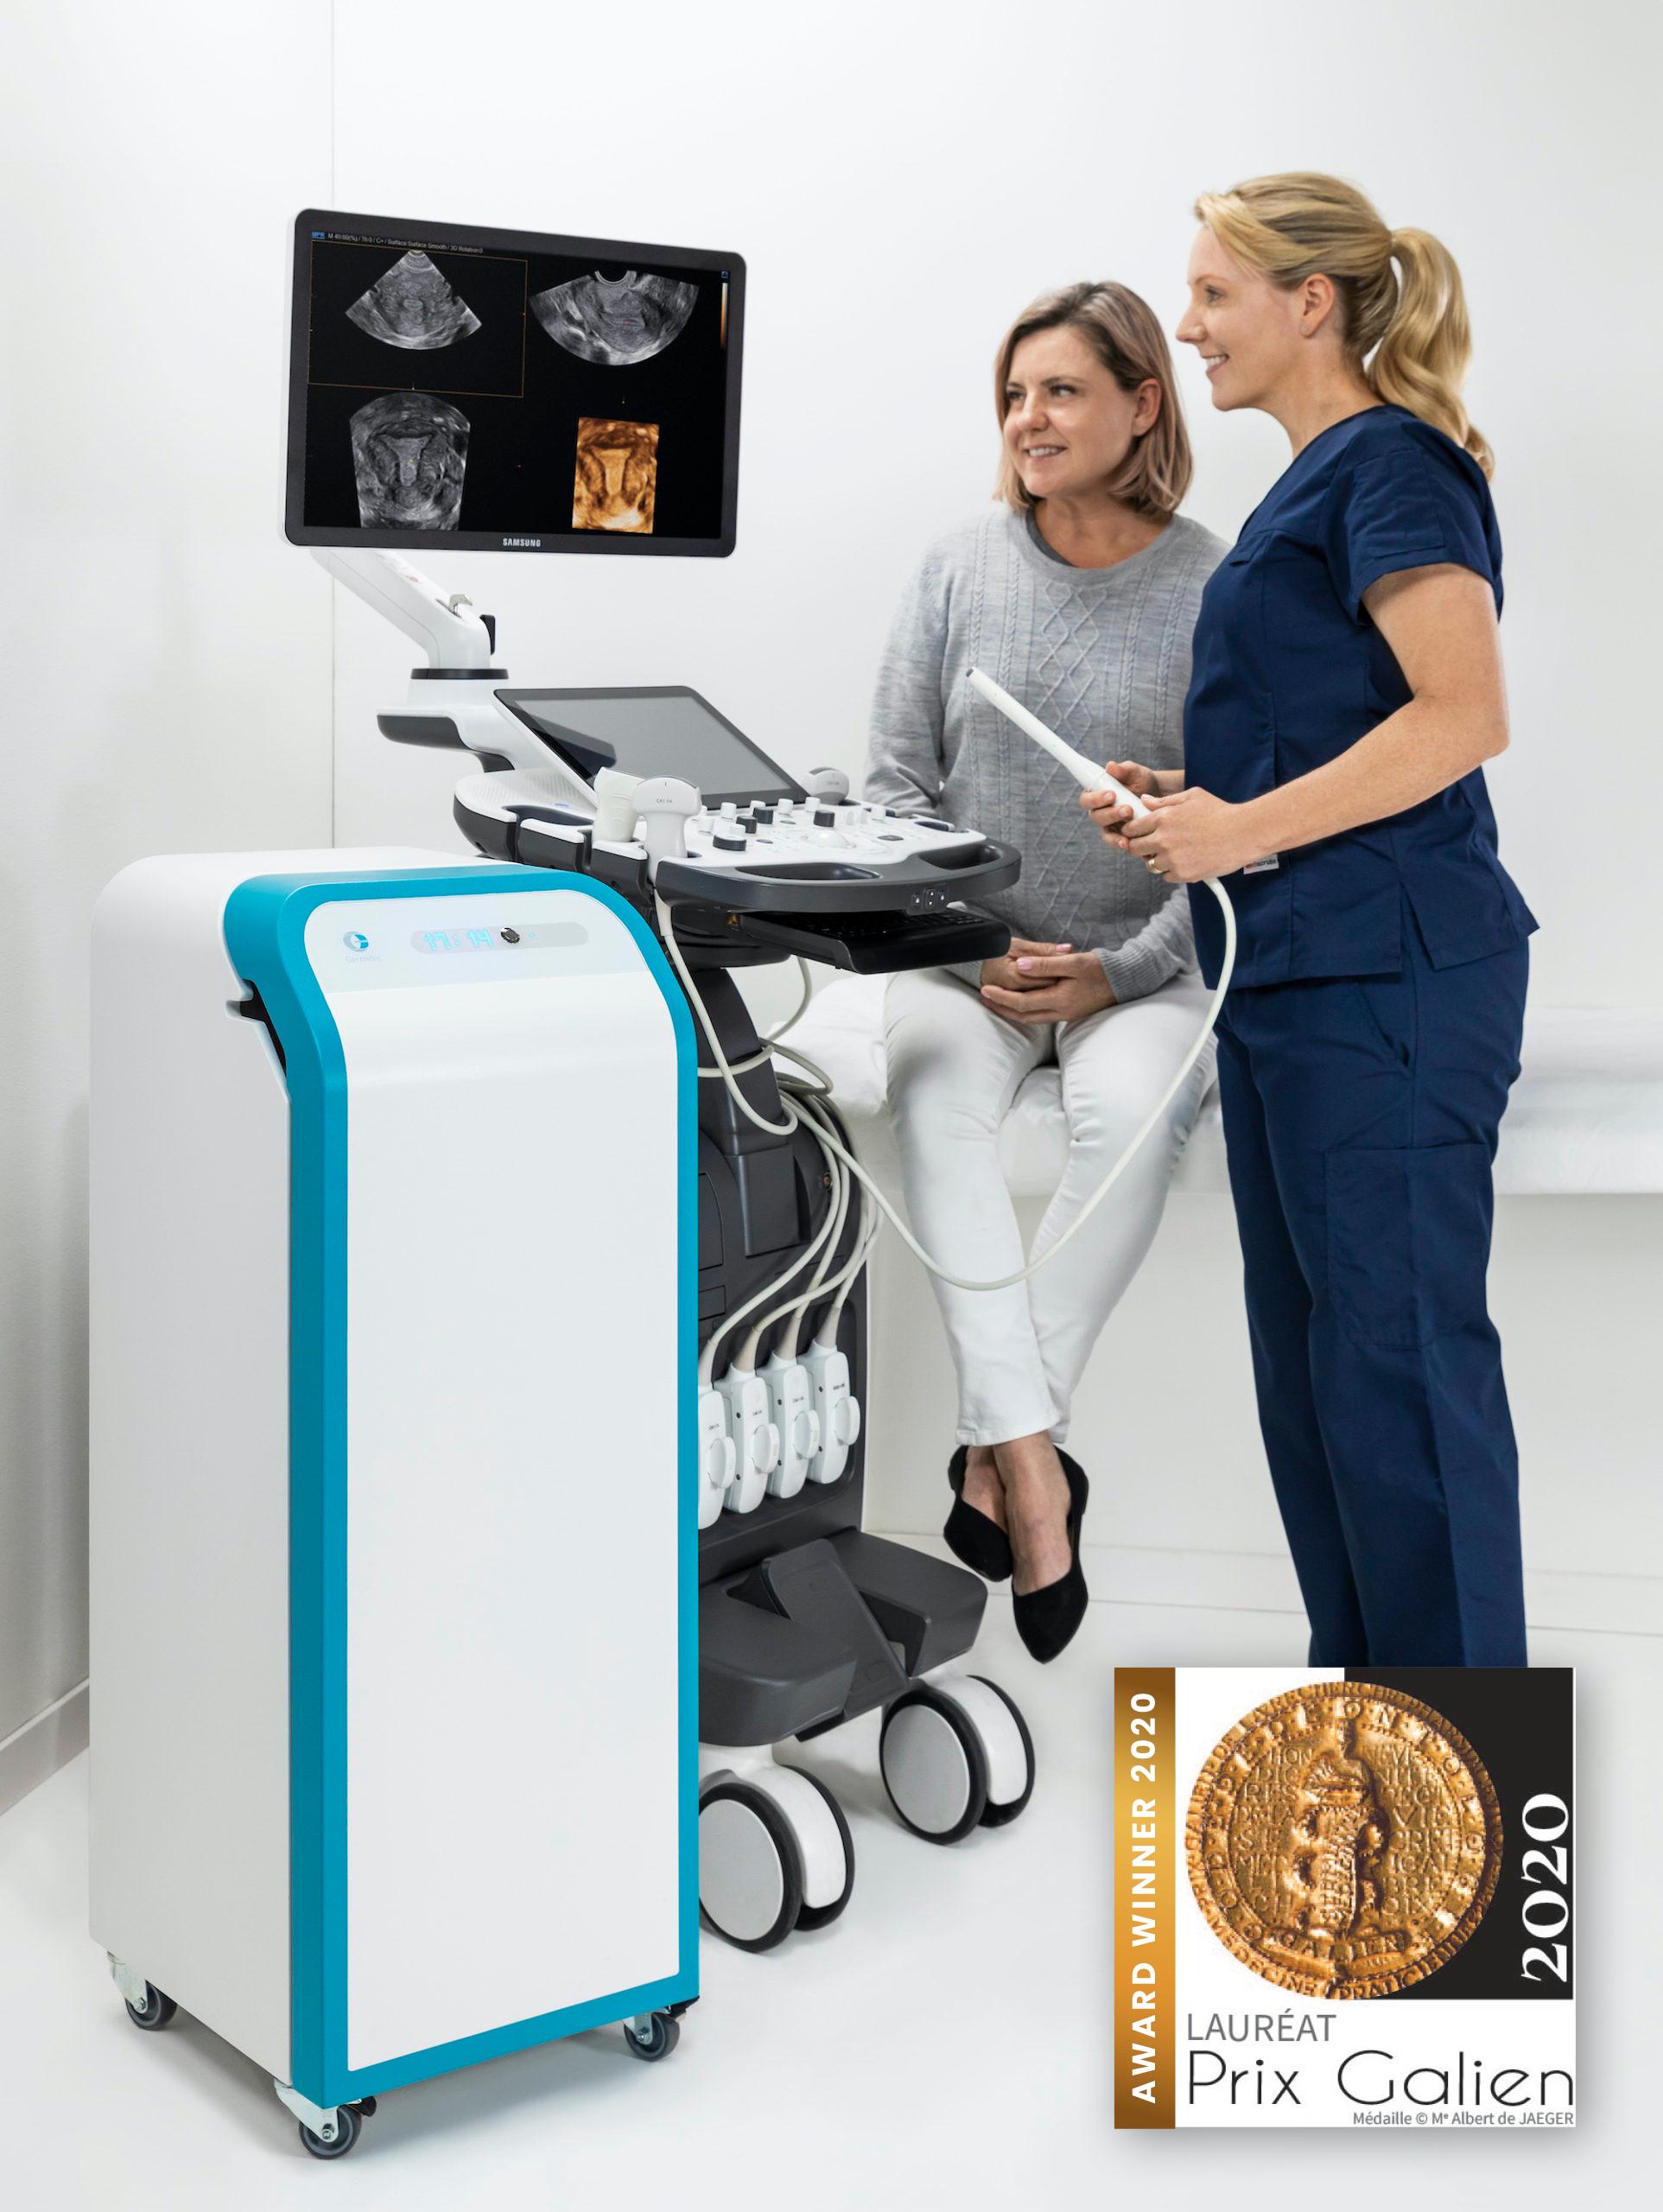 Hypernova Chronos Prix Galien Award Best Medical Device HLD